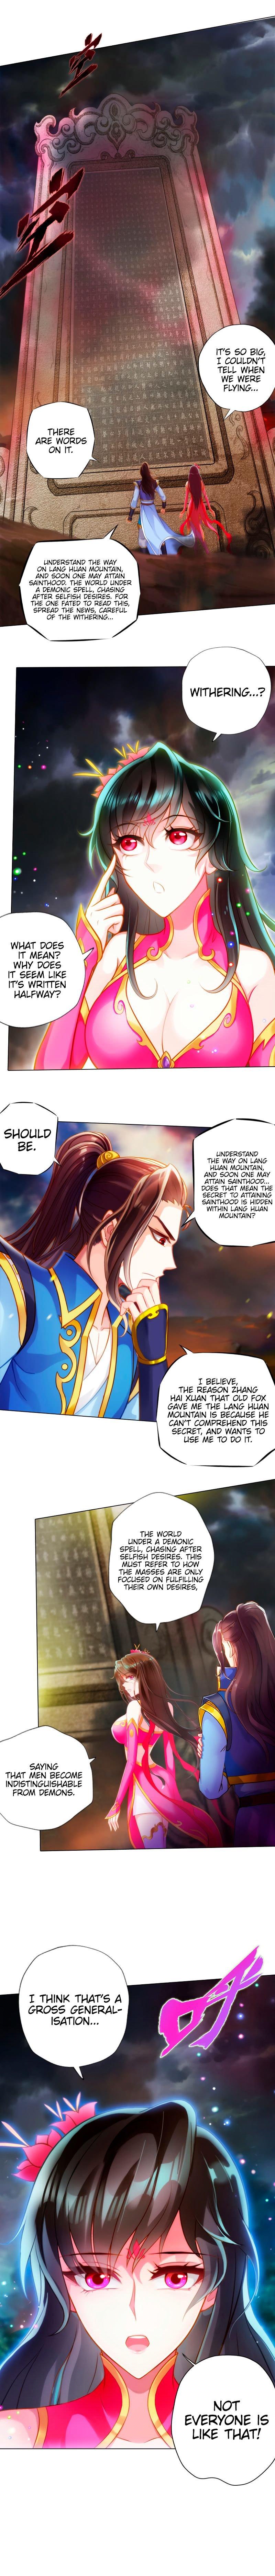 Manga Lang Huan Library - Chapter 80 Page 8